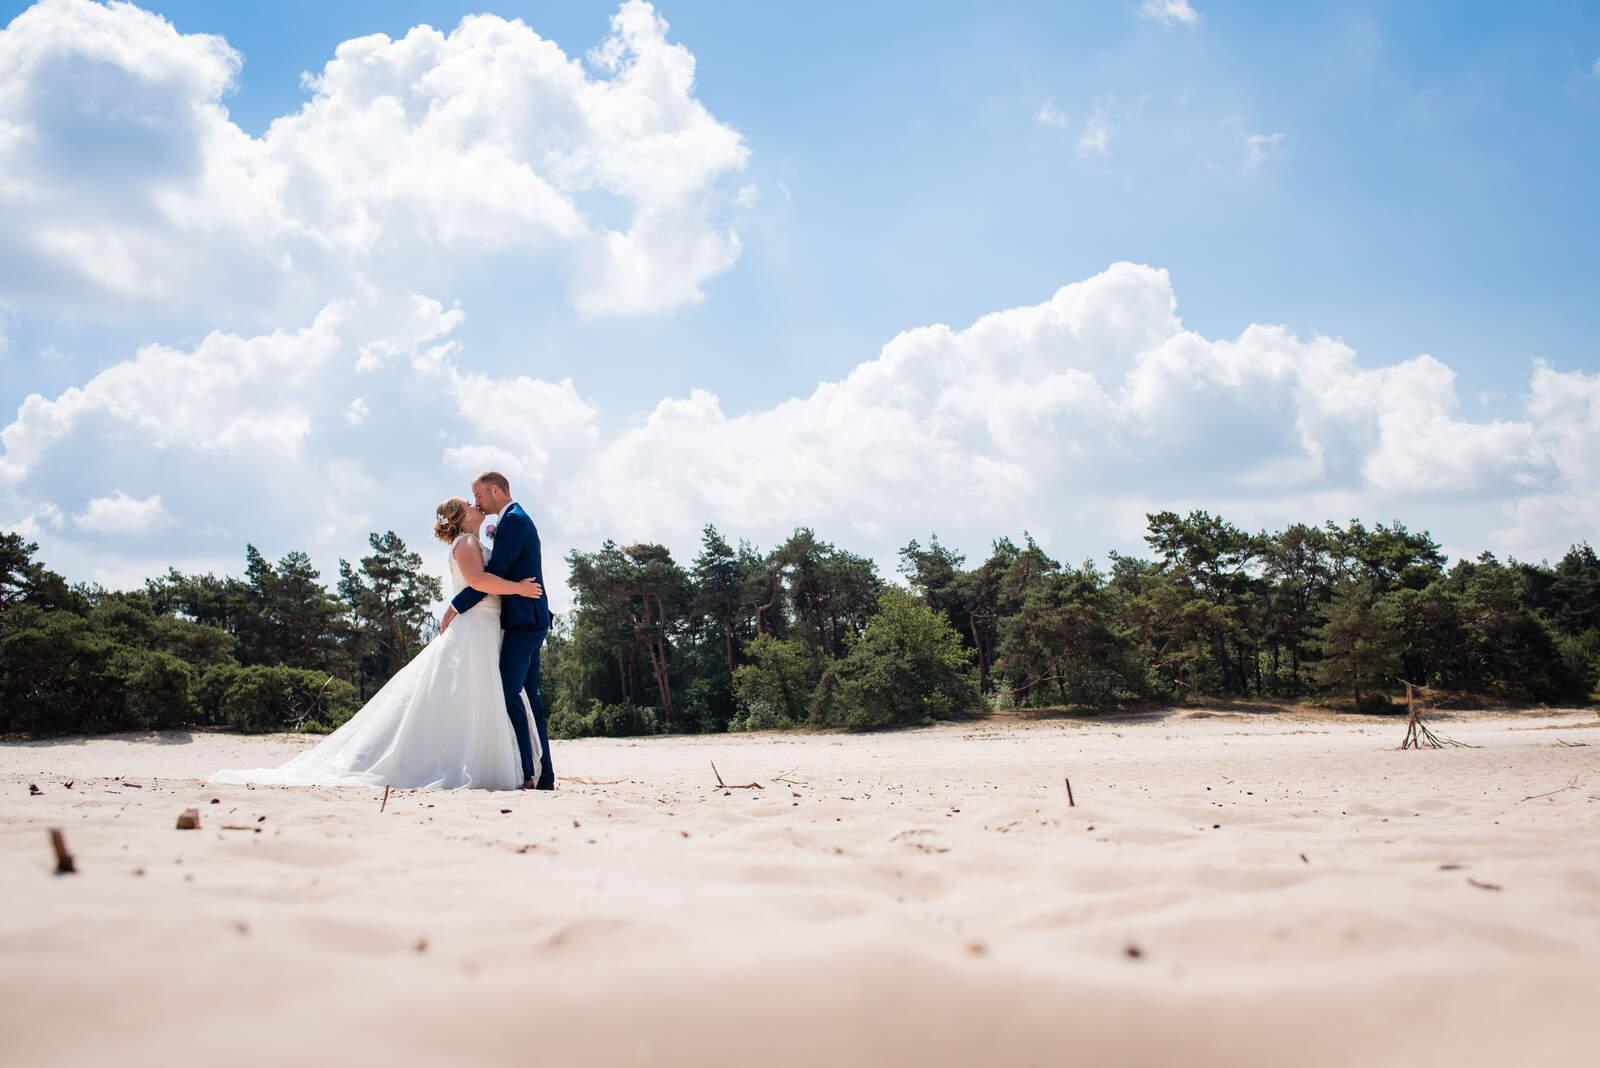 lichte en romantische trouwfoto stijl